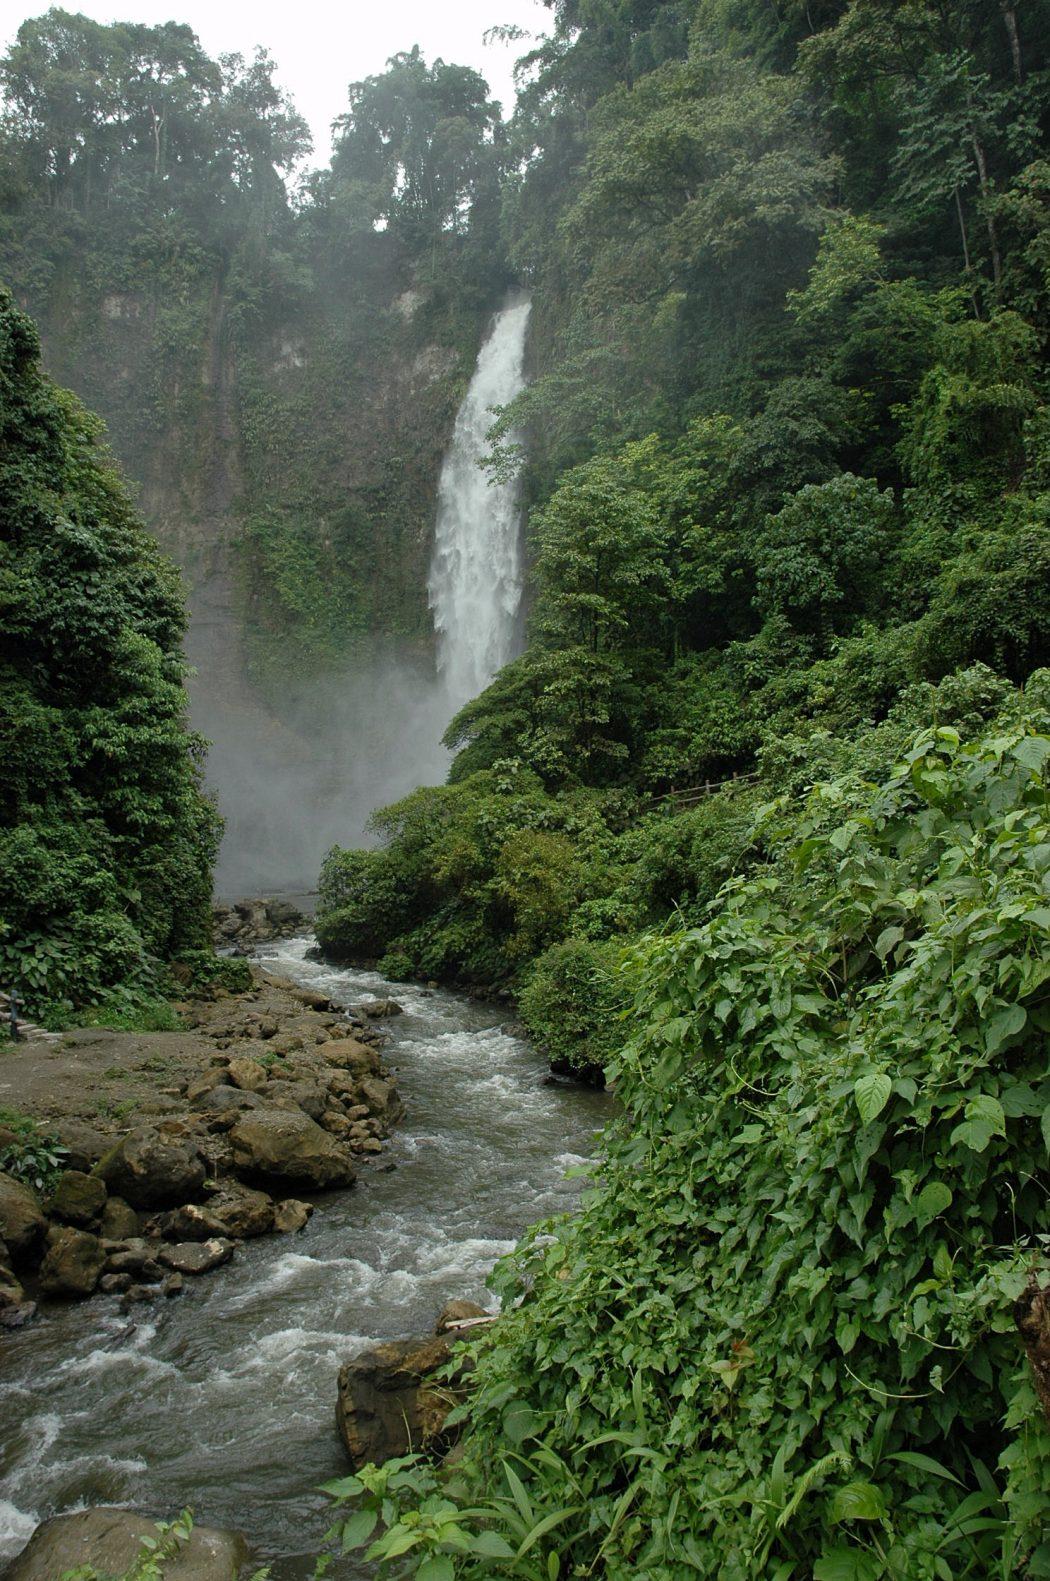 Landscapes__Seven_Falls_no_2 18 Most Inspiring Landscapes In The World